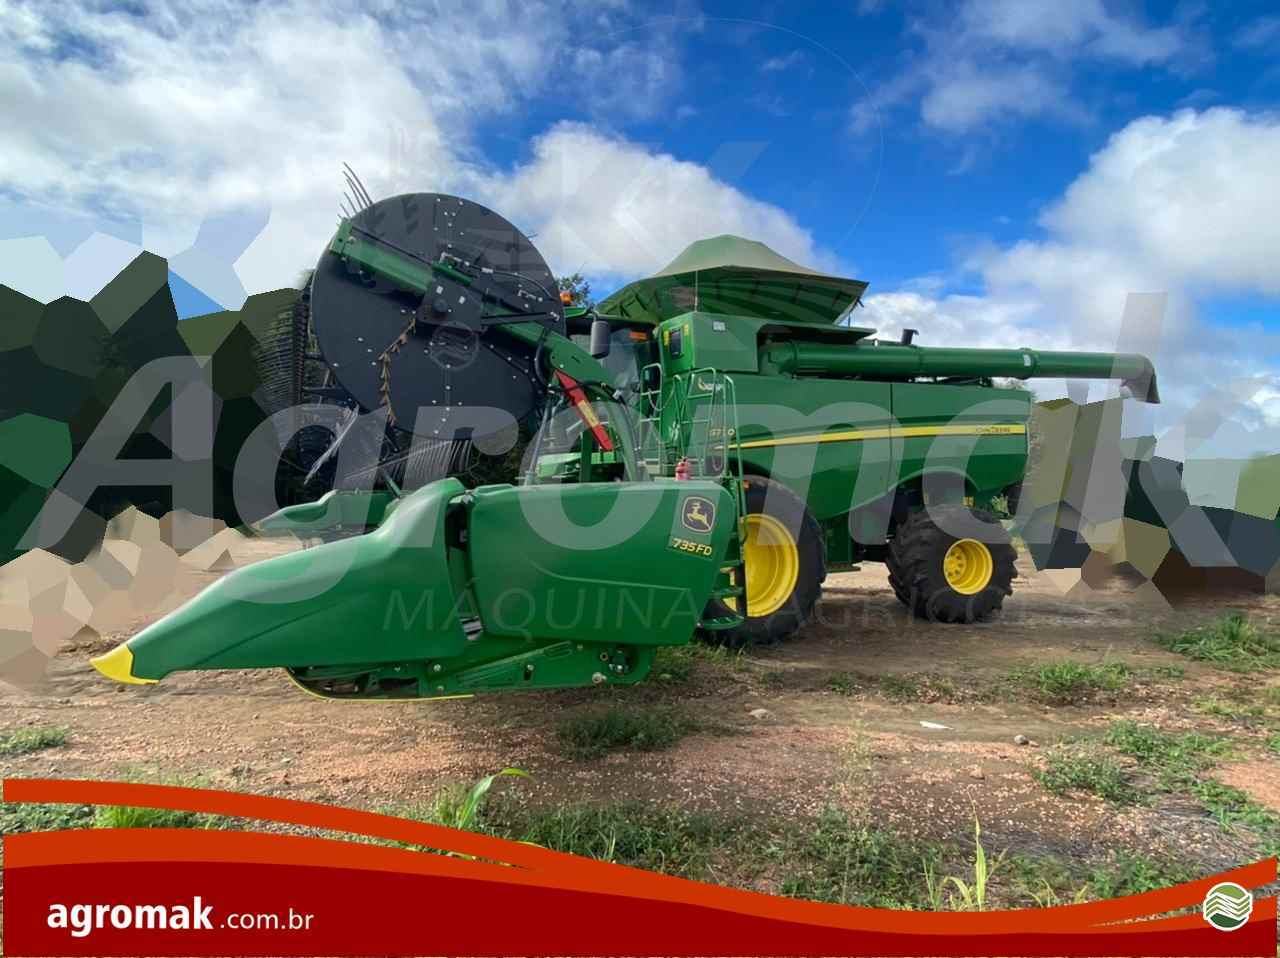 JOHN DEERE JOHN DEERE S770  2020/2020 Agromak Máquinas Agrícolas